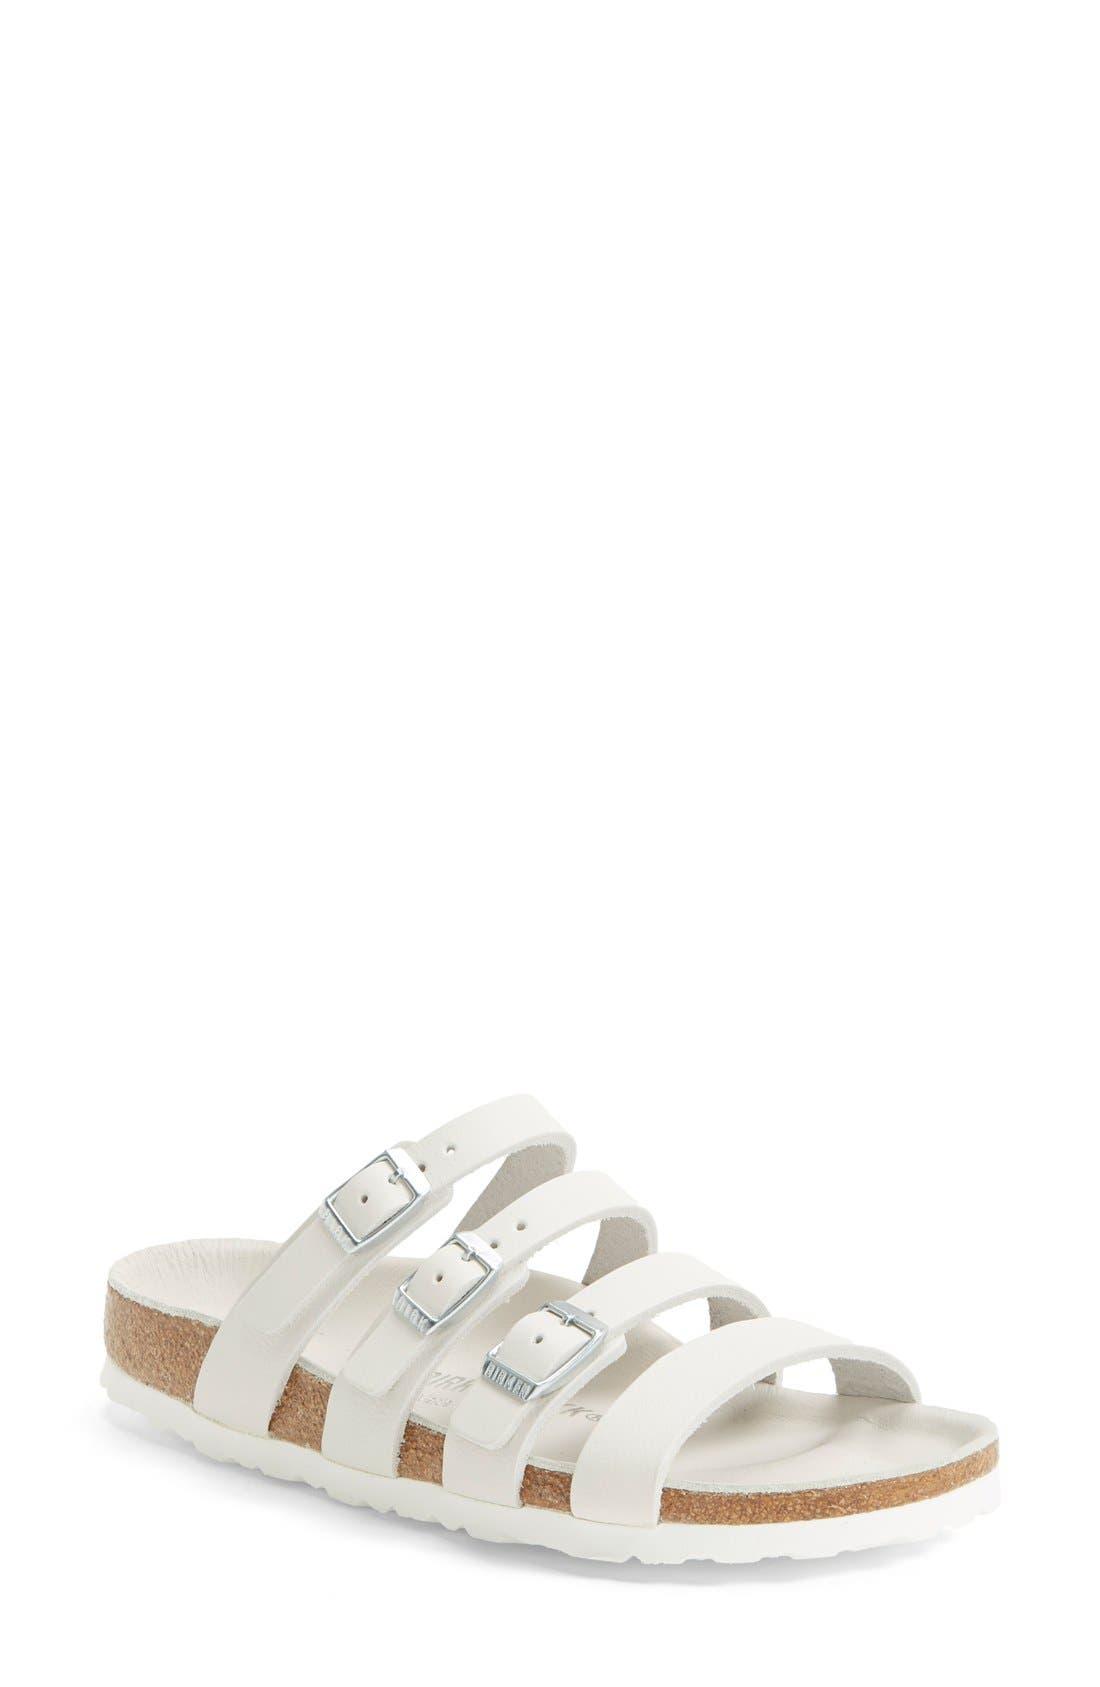 Main Image - Birkenstock 'Delmas' Leather Sandal (Women)